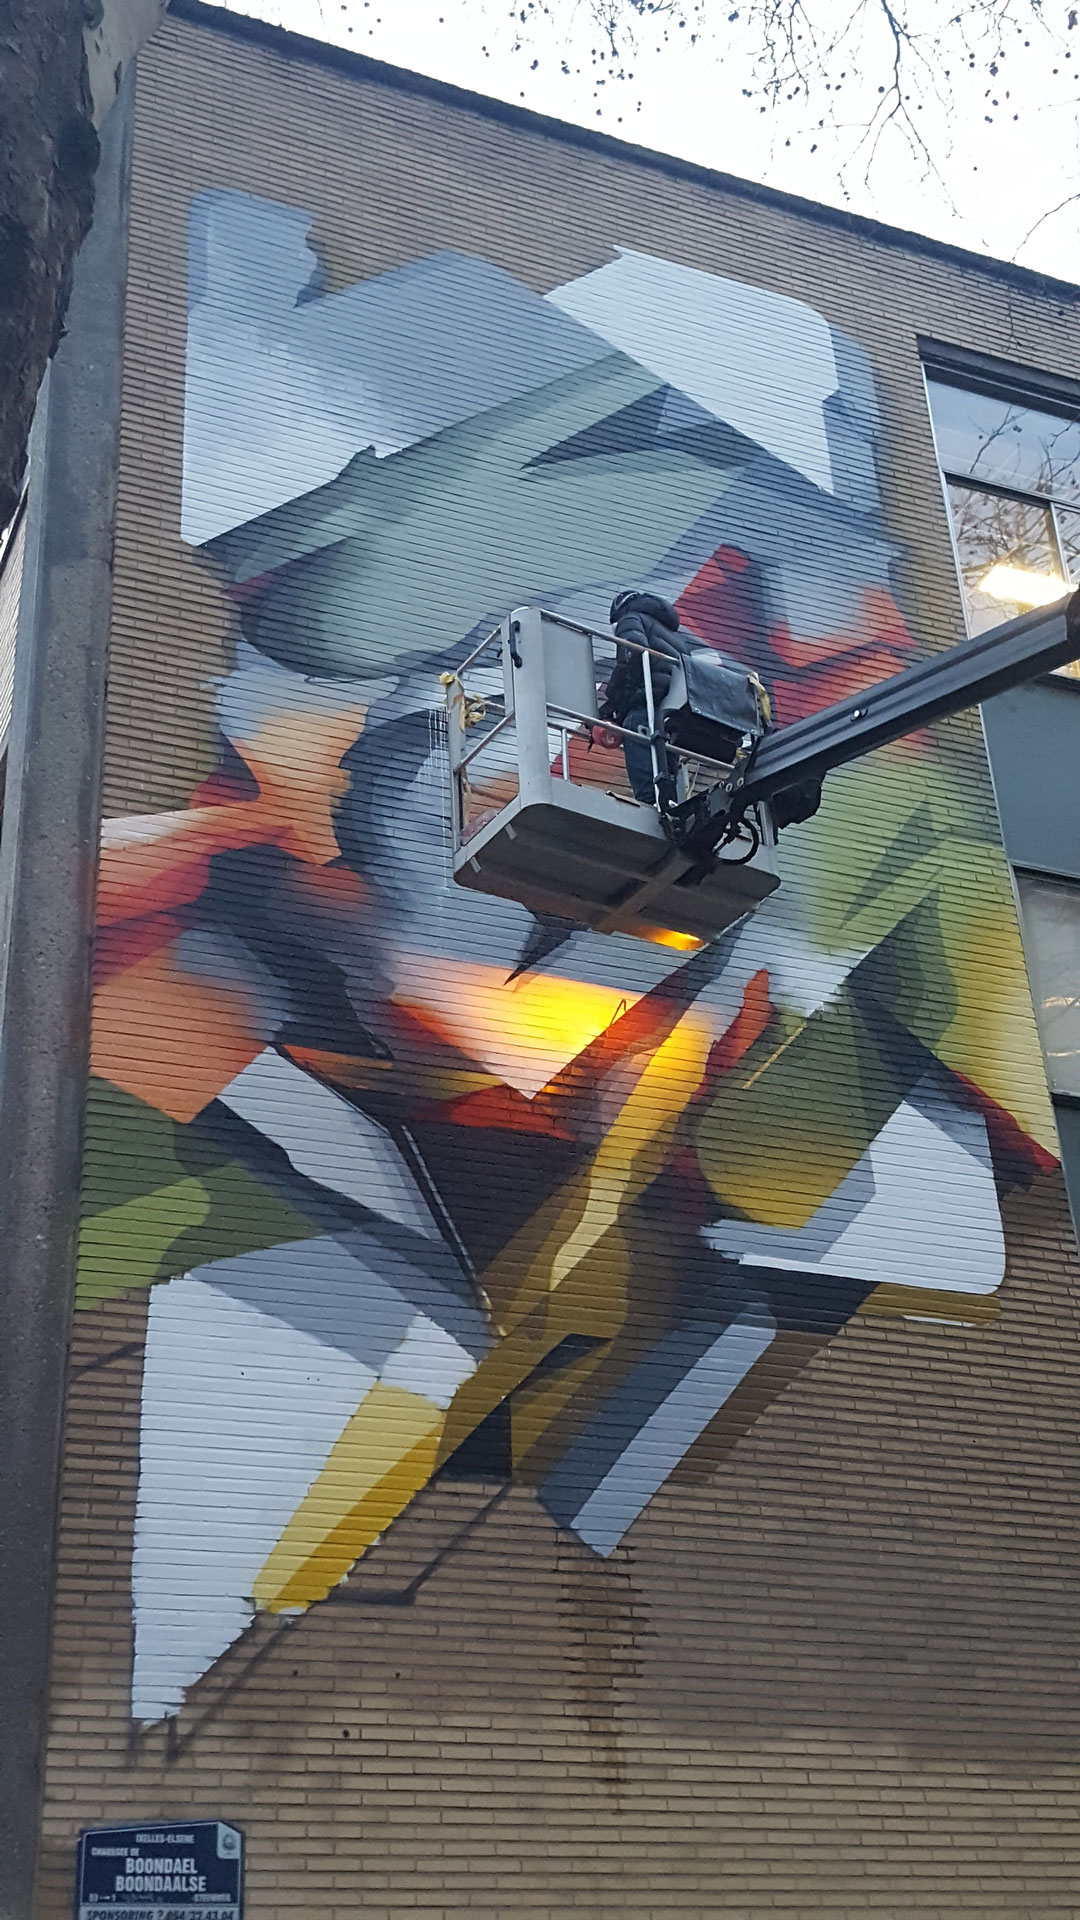 https://www.propaganza.be/wp-content/uploads/2020/02/coordination-fresque-_-artiste-DOES-_-commune-dIxelles3.jpg